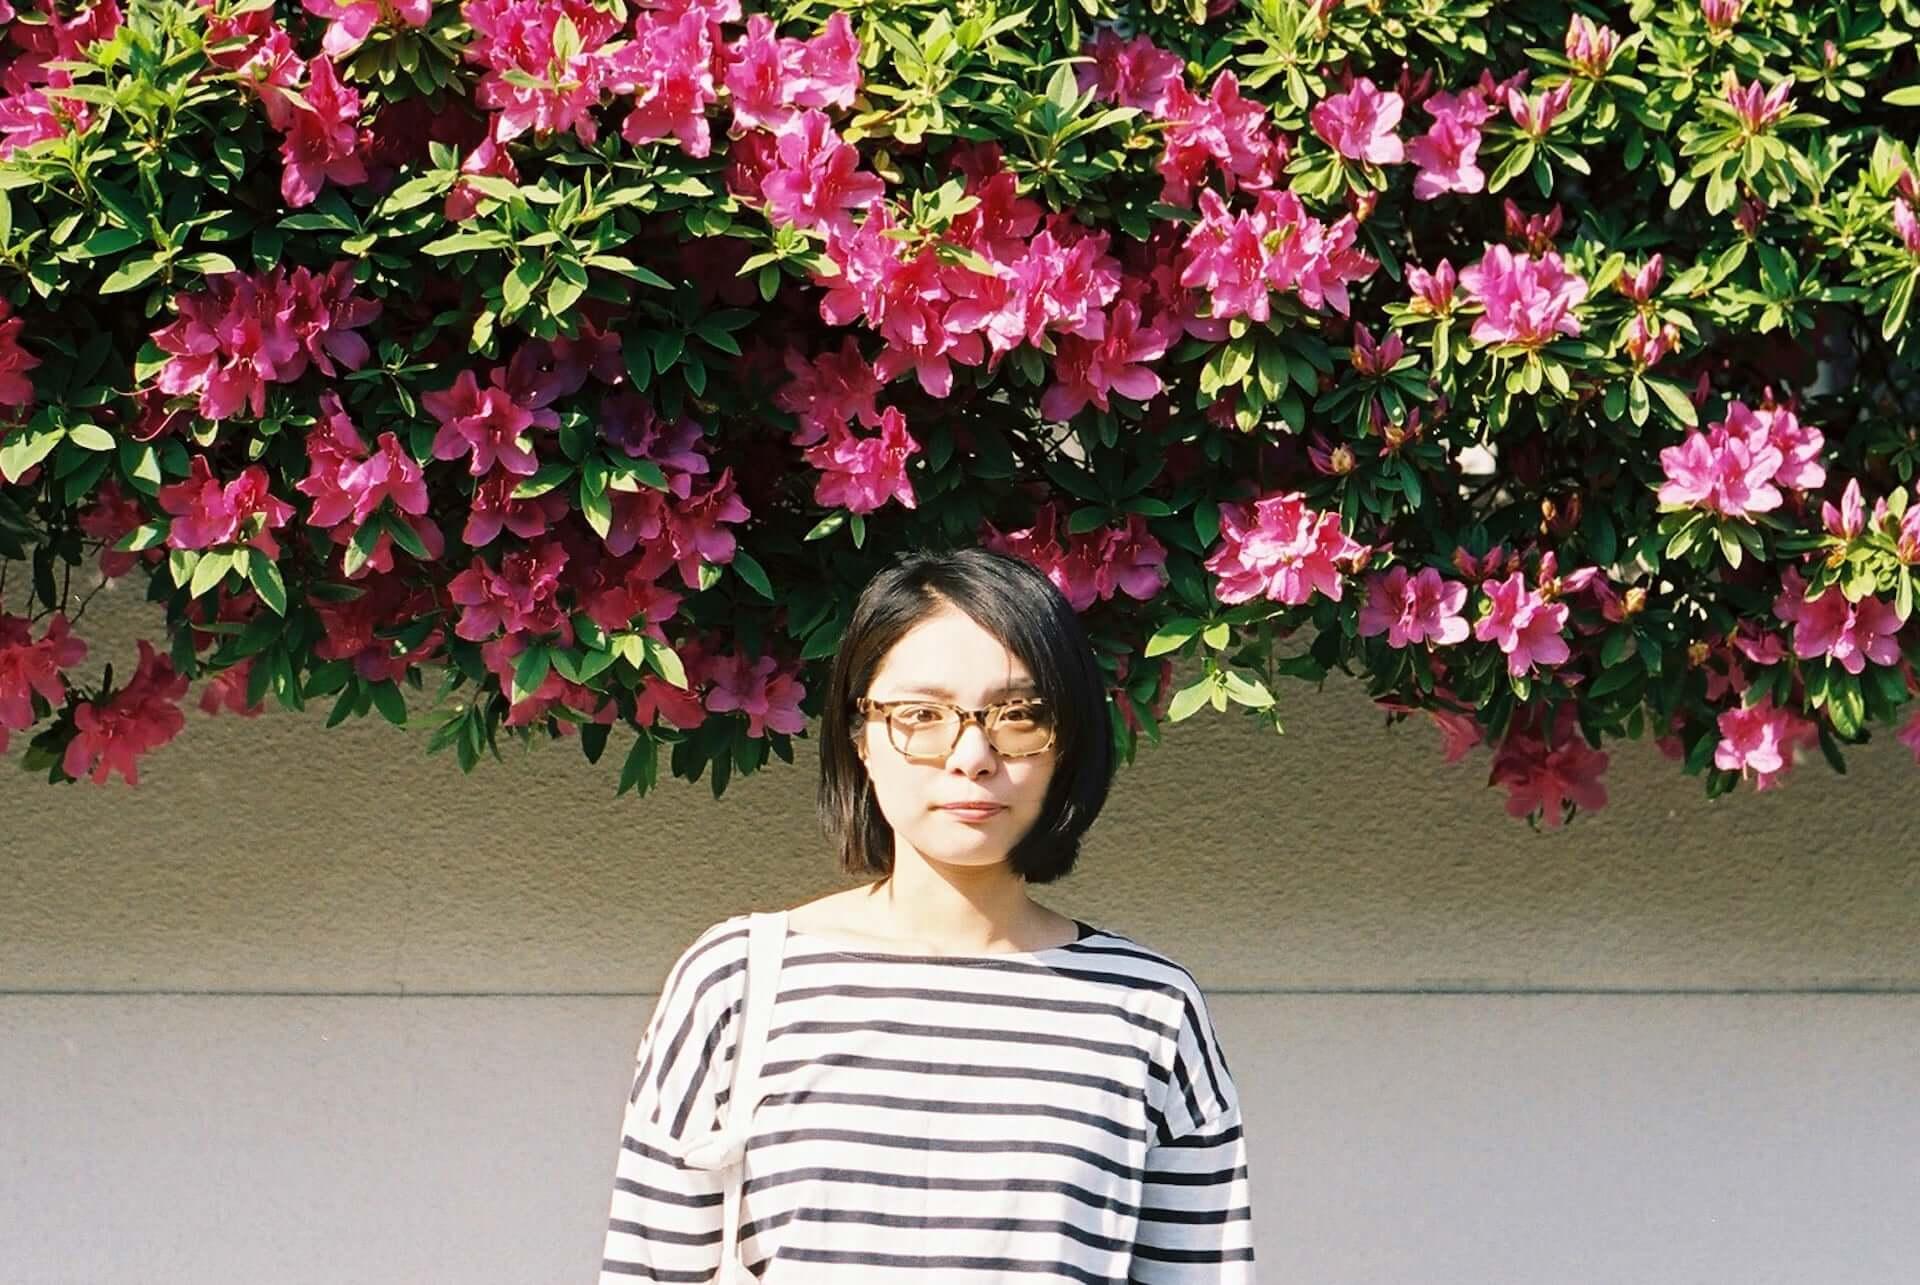 <MUSO Culture Festival>のメイン会場がバーチャル大中寺に変更!Kaoru Inoue、ELLI ARAKAWAらのスペシャルミックスも公開決定 music210129_muso-festival_4-1920x1285